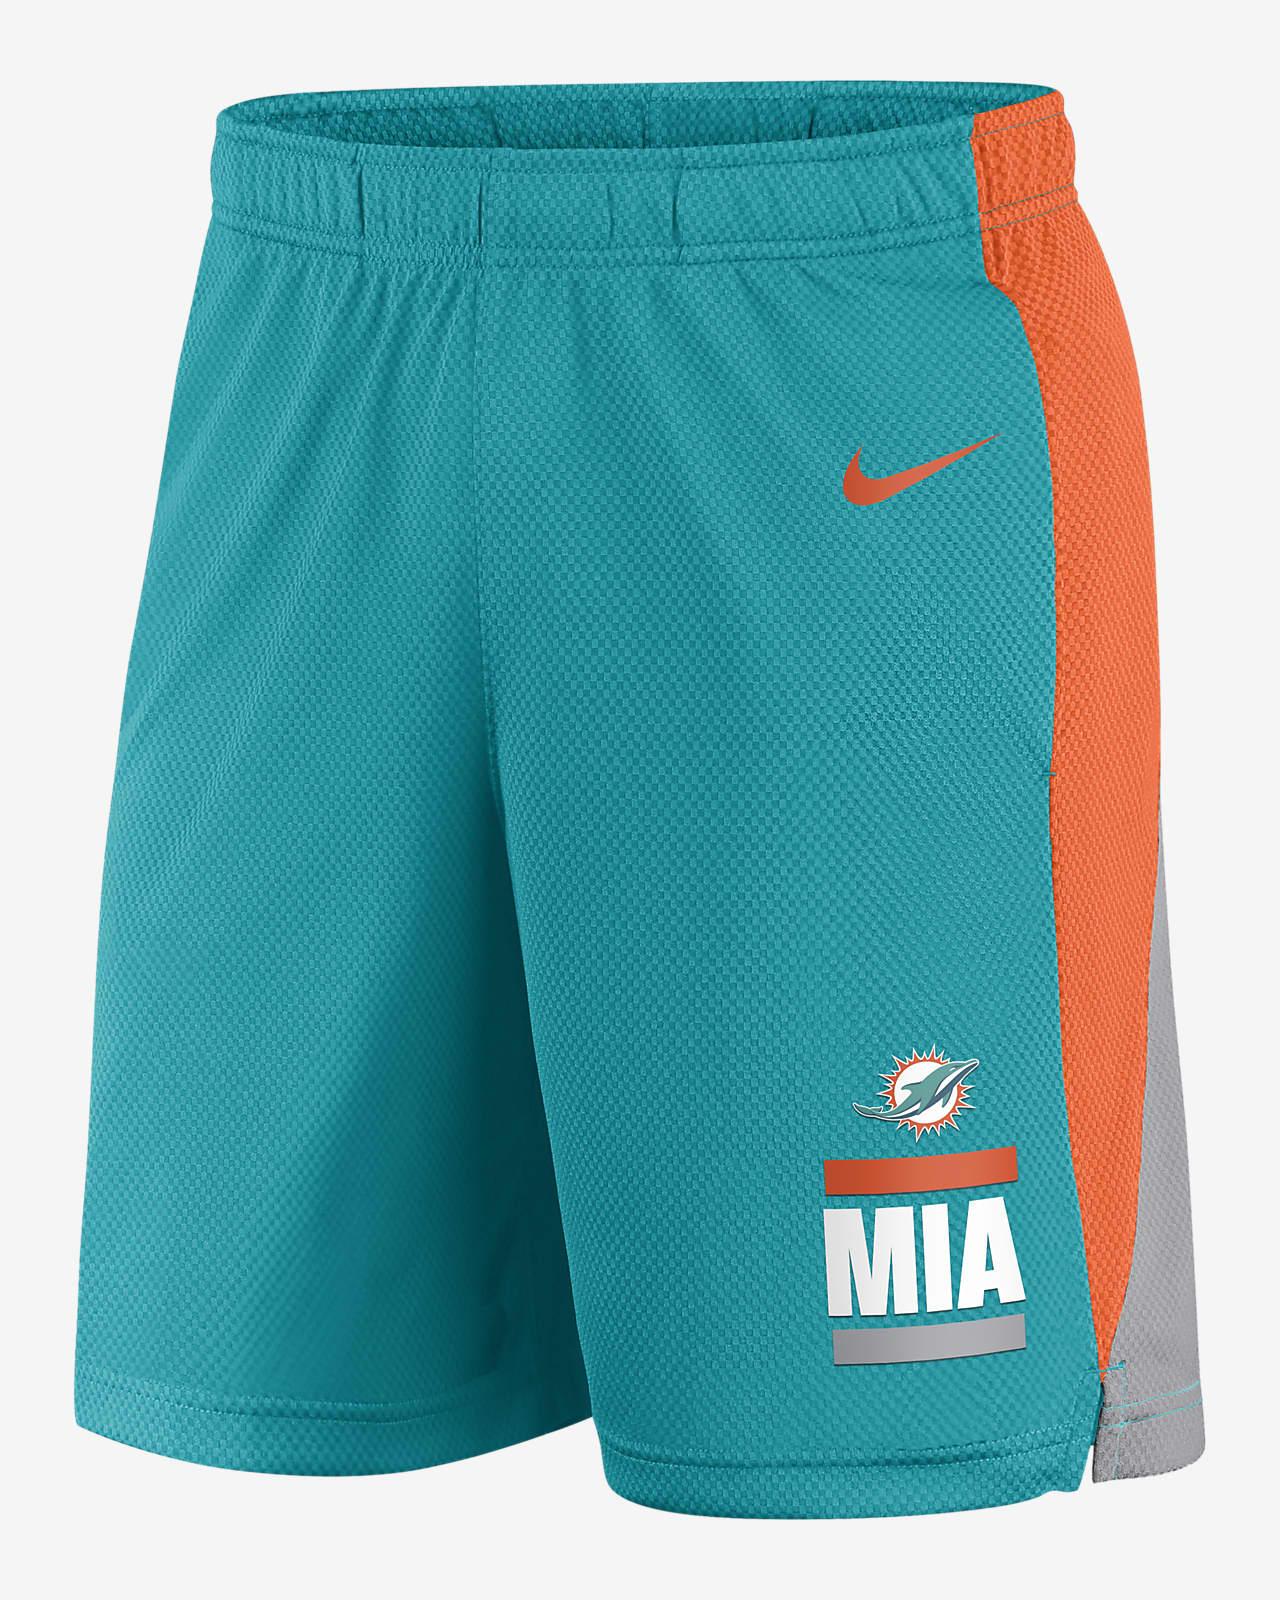 Nike Dri-FIT Broadcast (NFL Miami Dolphins) Men's Shorts